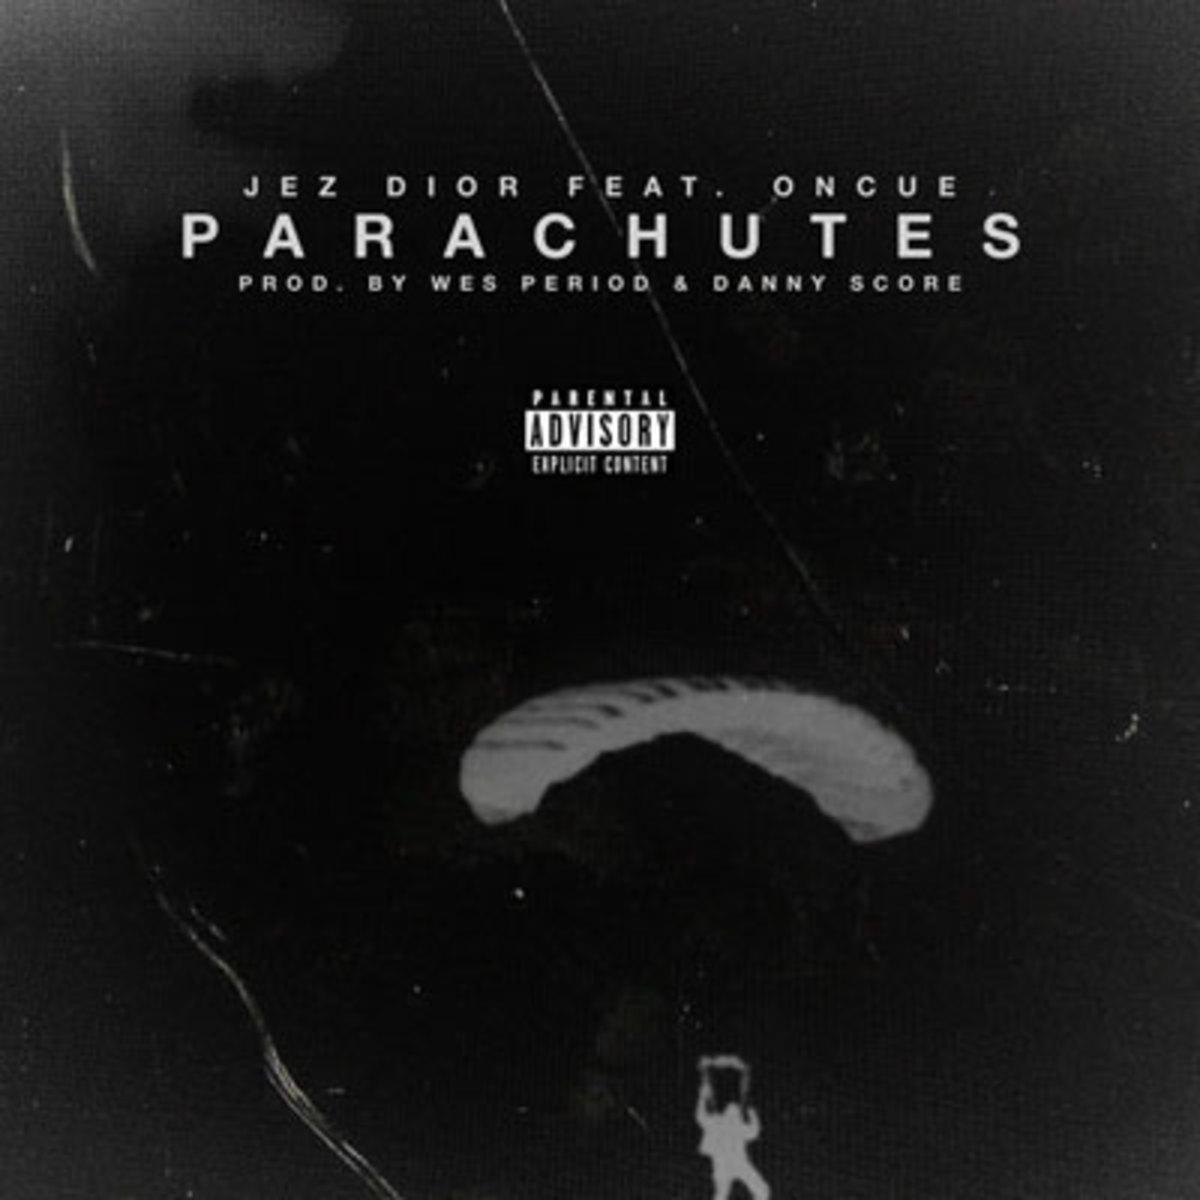 jezdior-parachutes.jpg